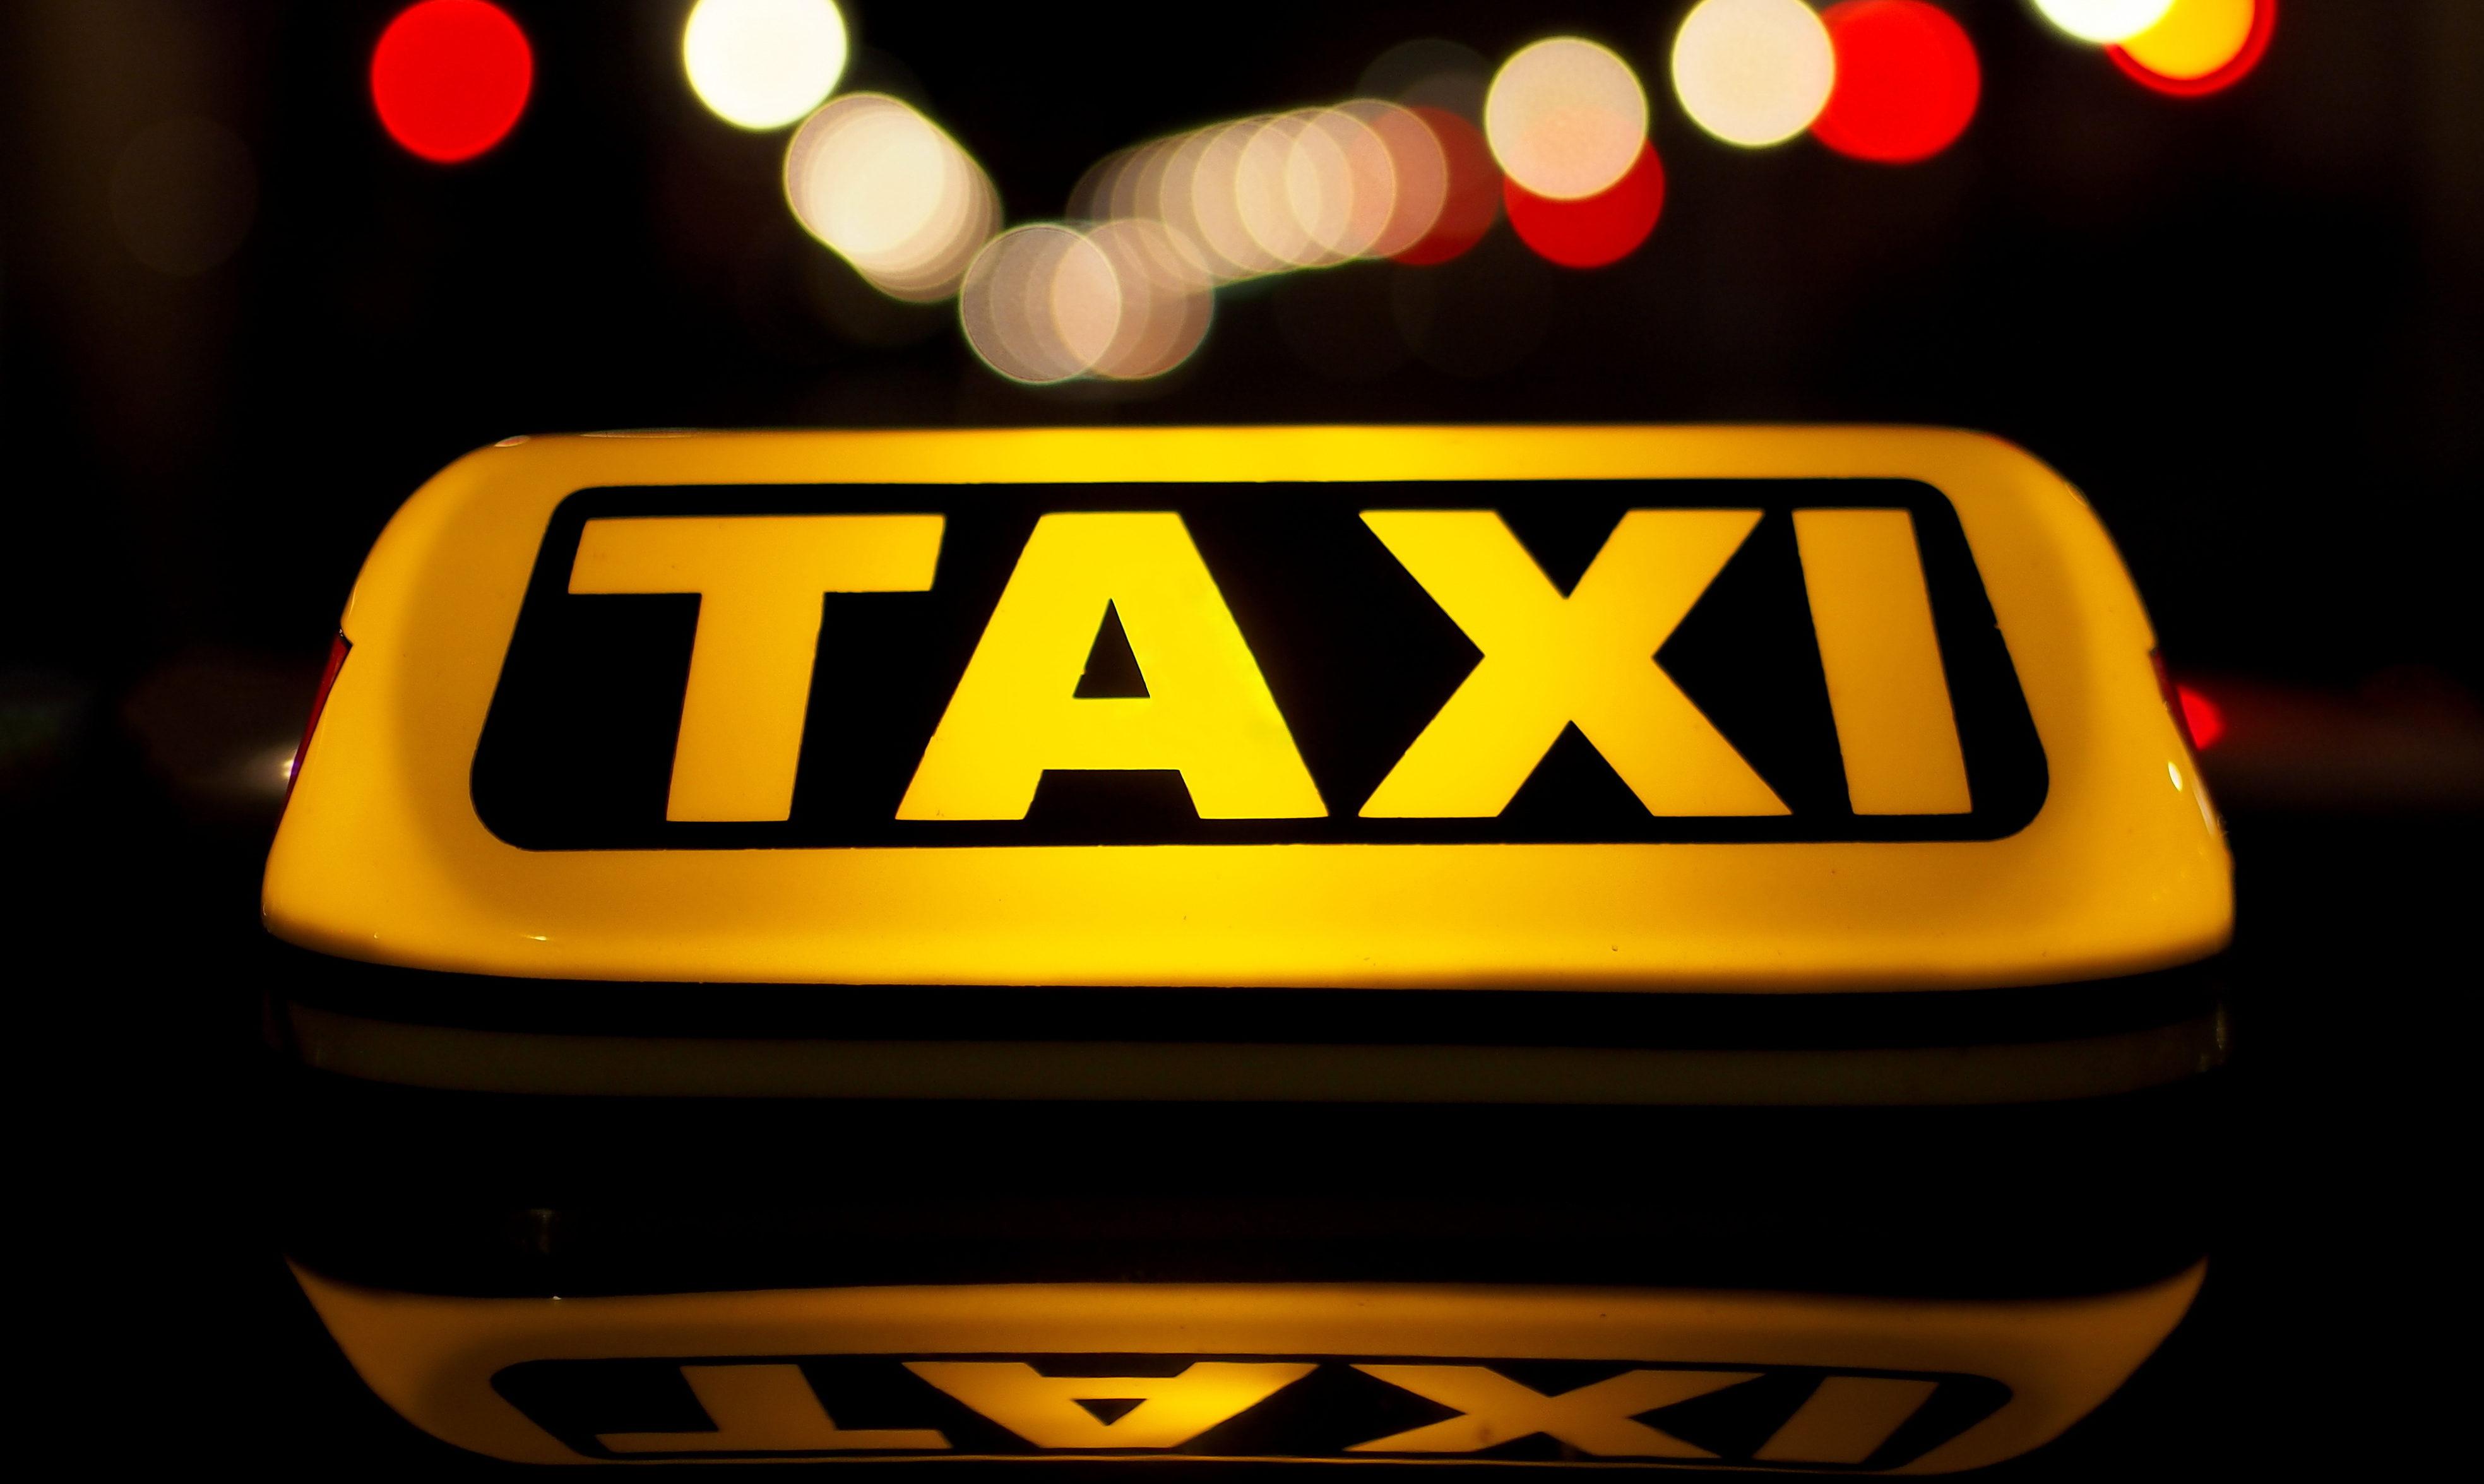 preturi taxi chisinau, numere de taxi, firme de taxi